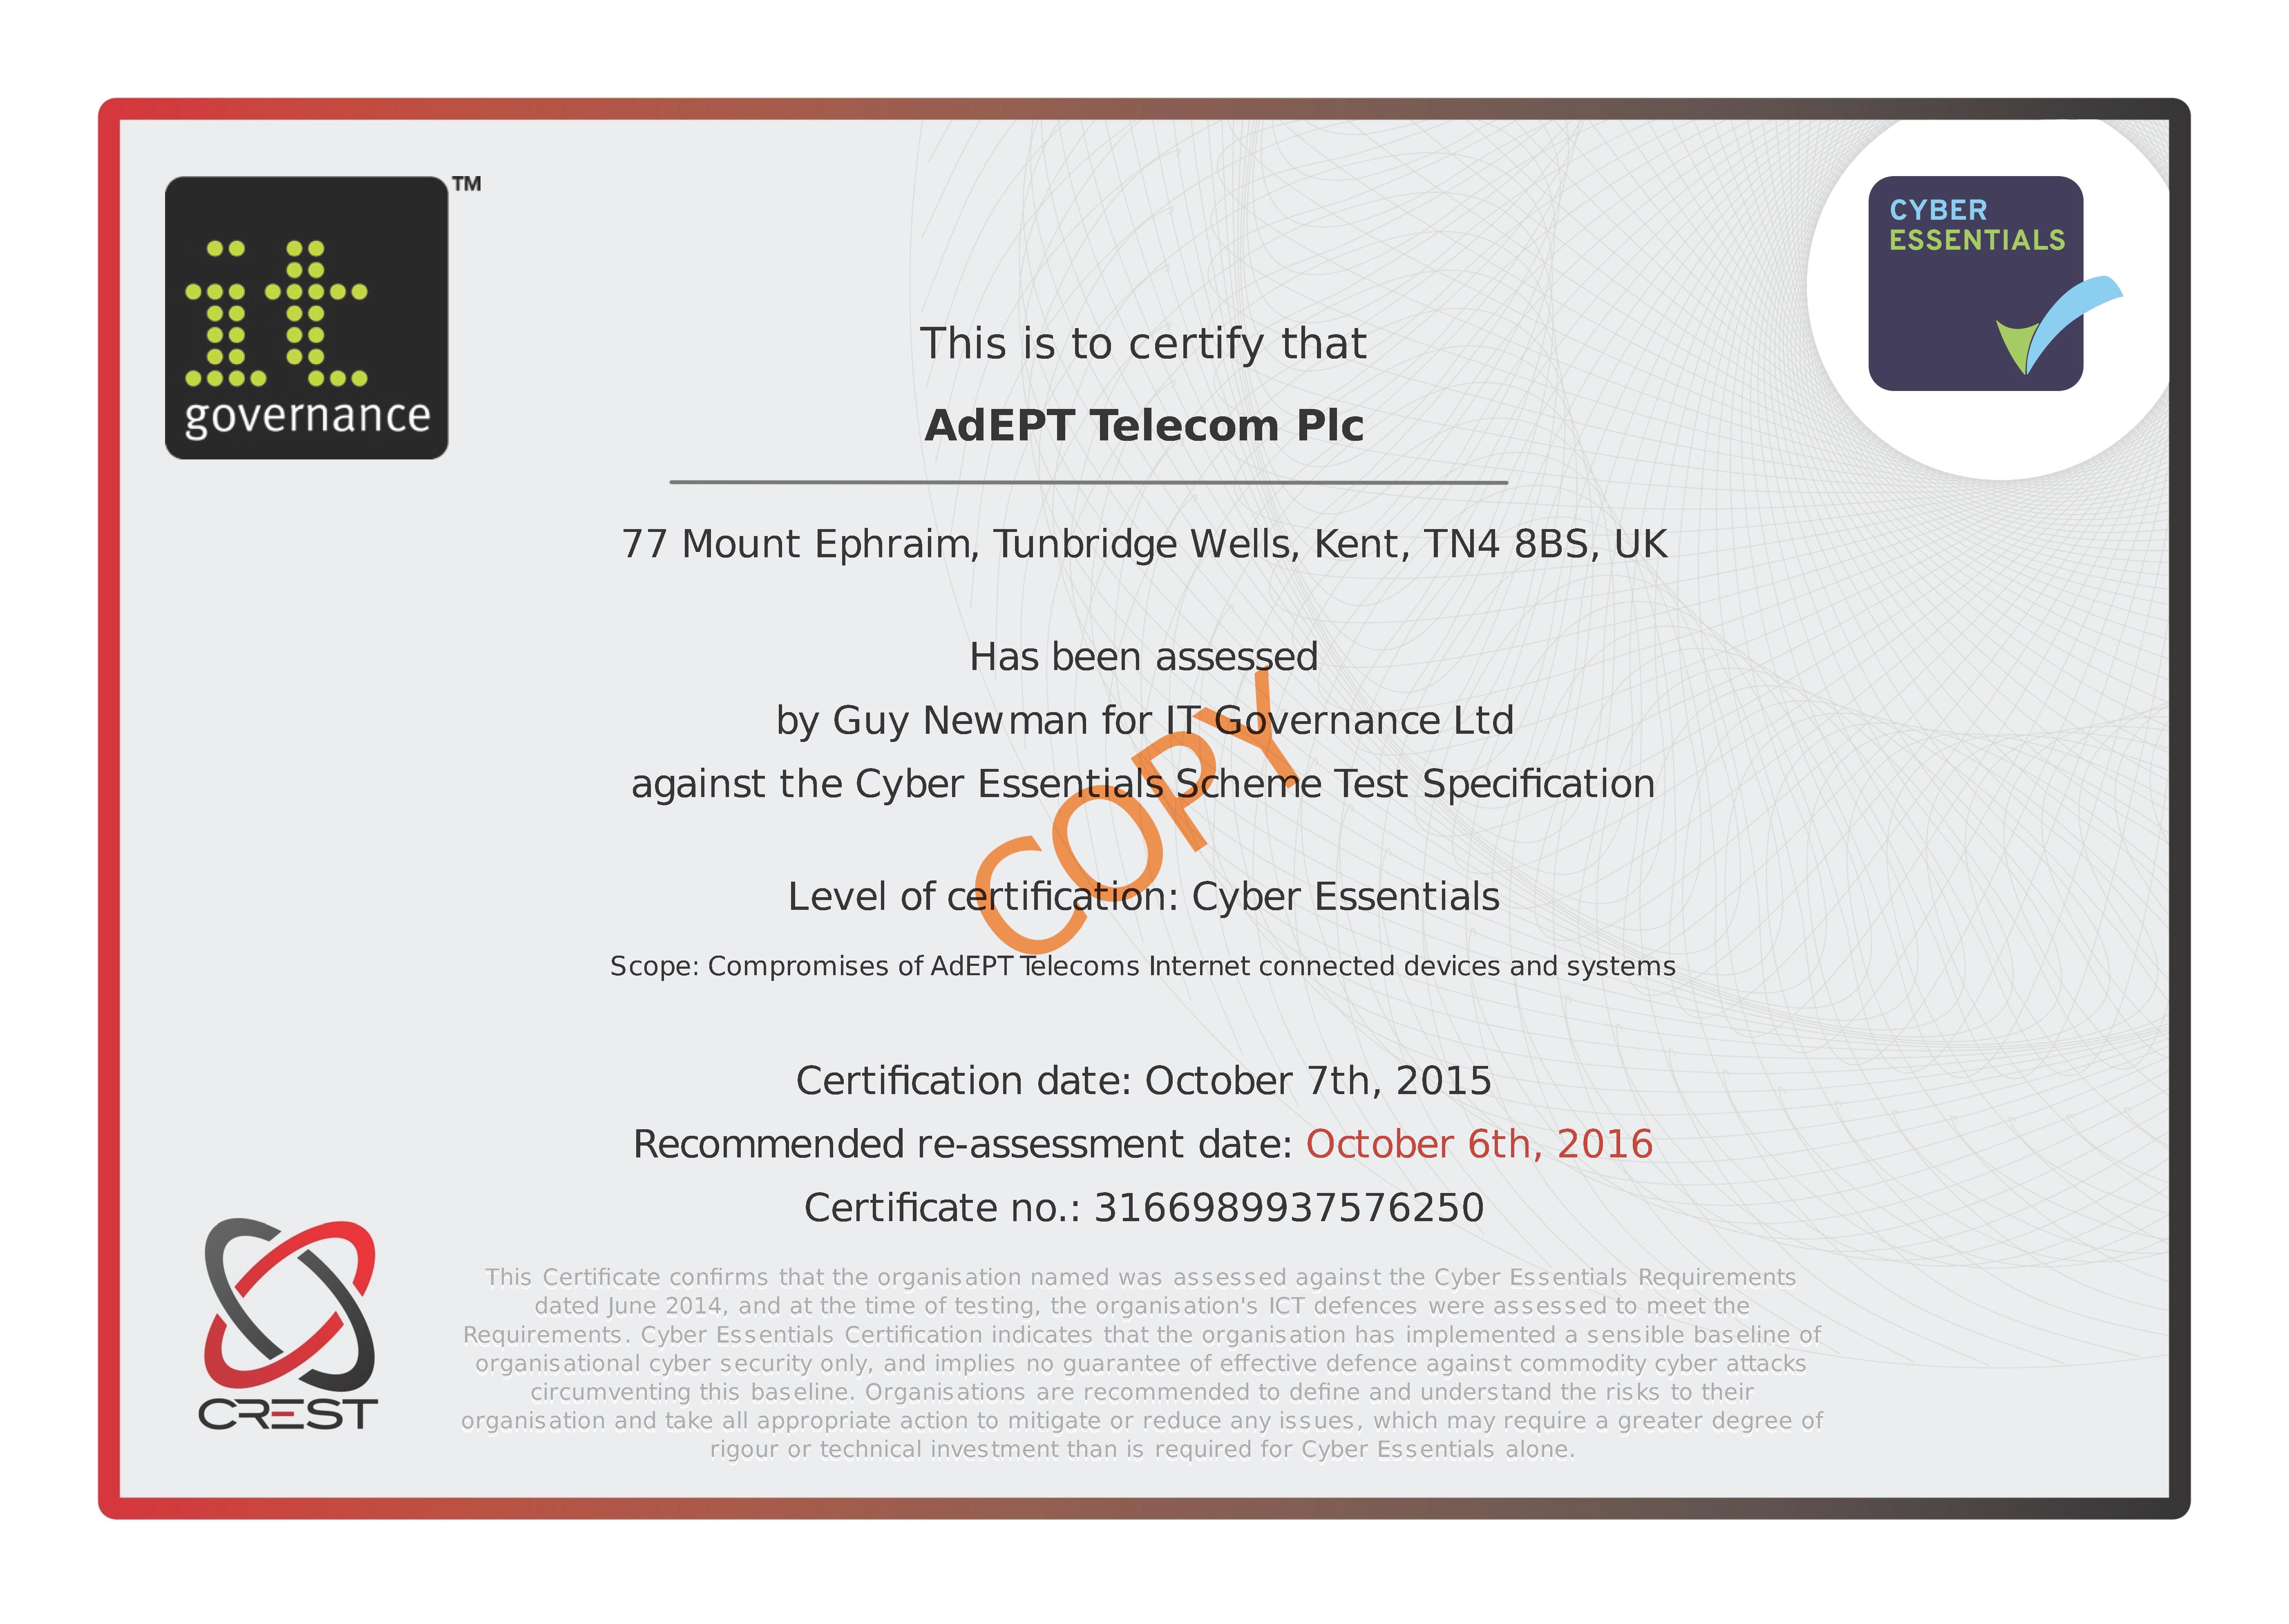 Adept Telecom Plc Ces Certificate 4950480431482208 Copy Stamped